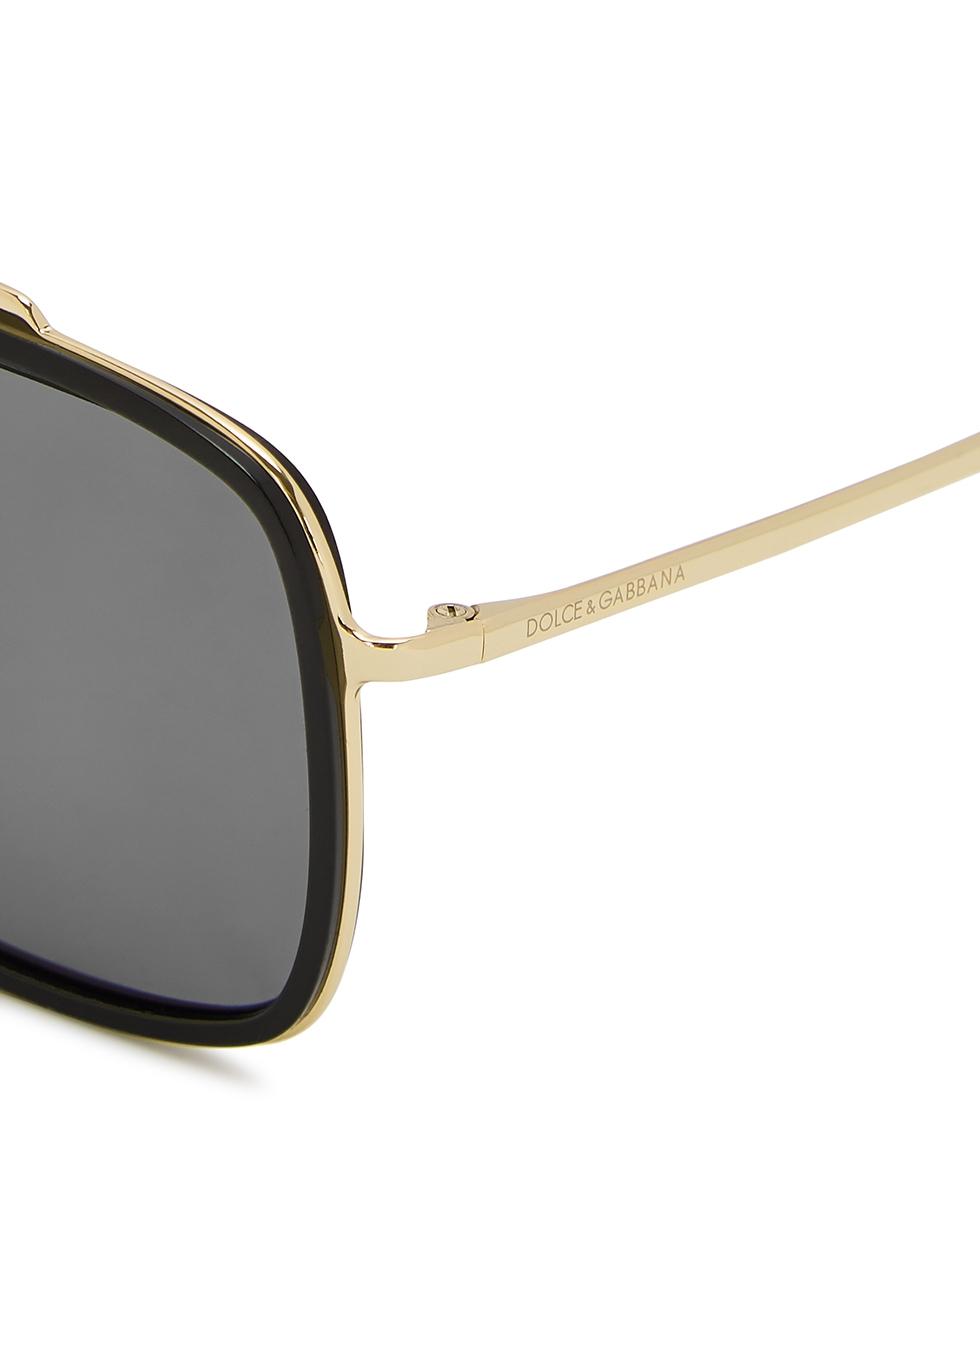 Gold-tone aviator-style sunglasses - Dolce & Gabbana